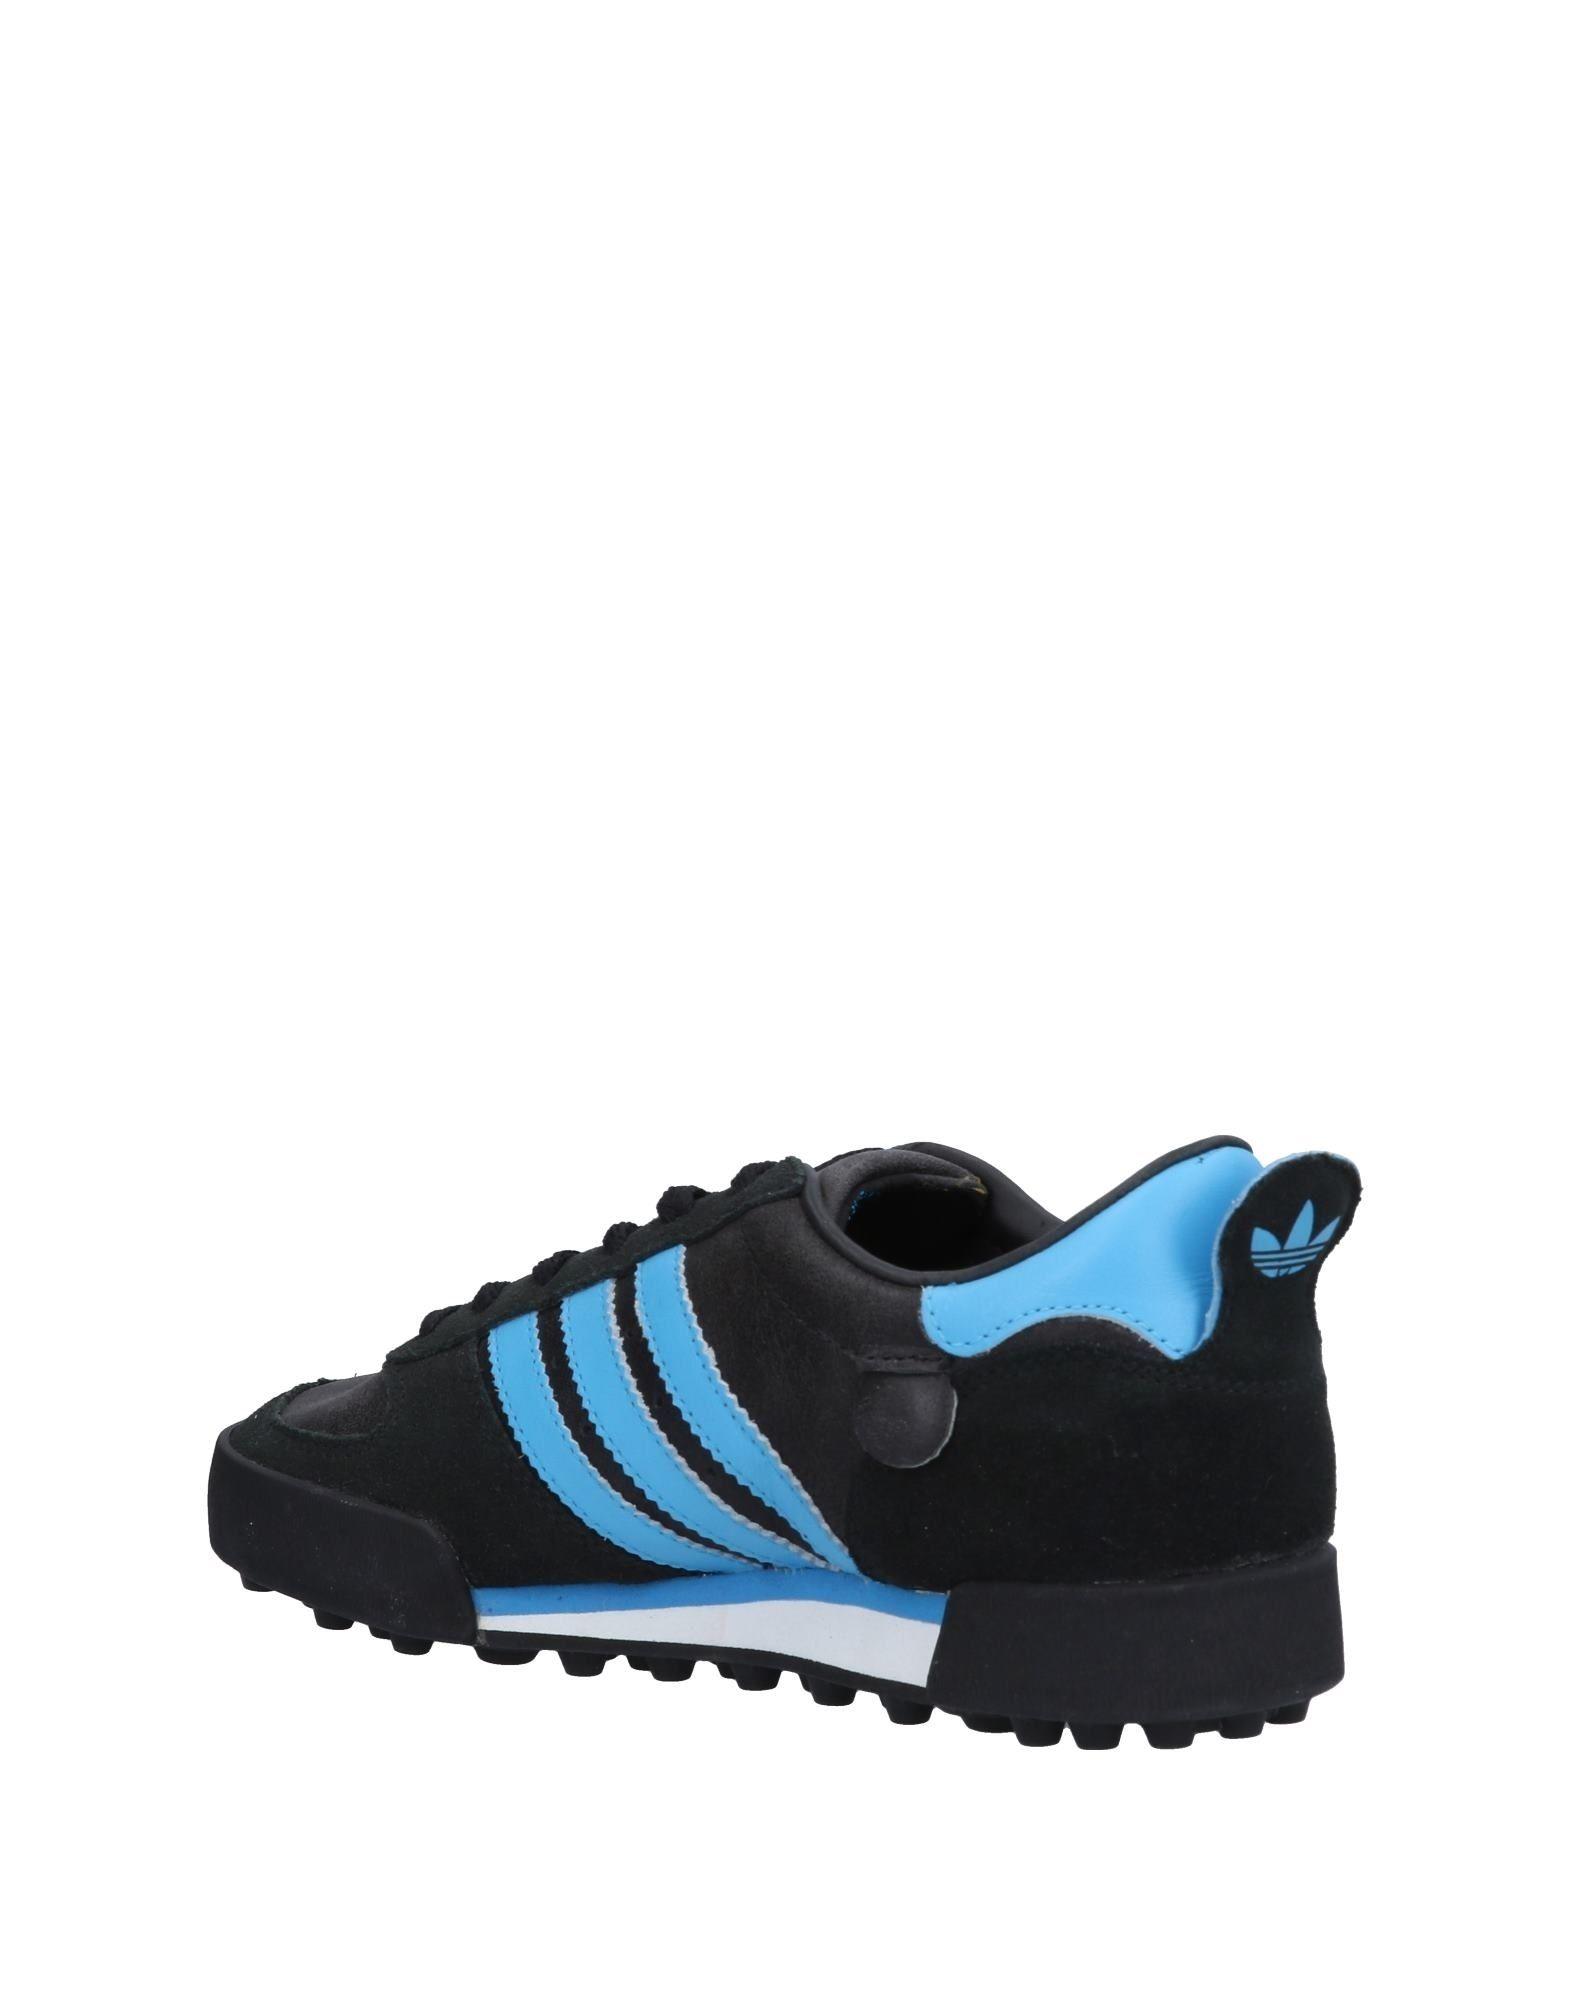 Adidas Adidas Adidas Originals Sneakers - Men Adidas Originals Sneakers online on  United Kingdom - 11498172BU c18695